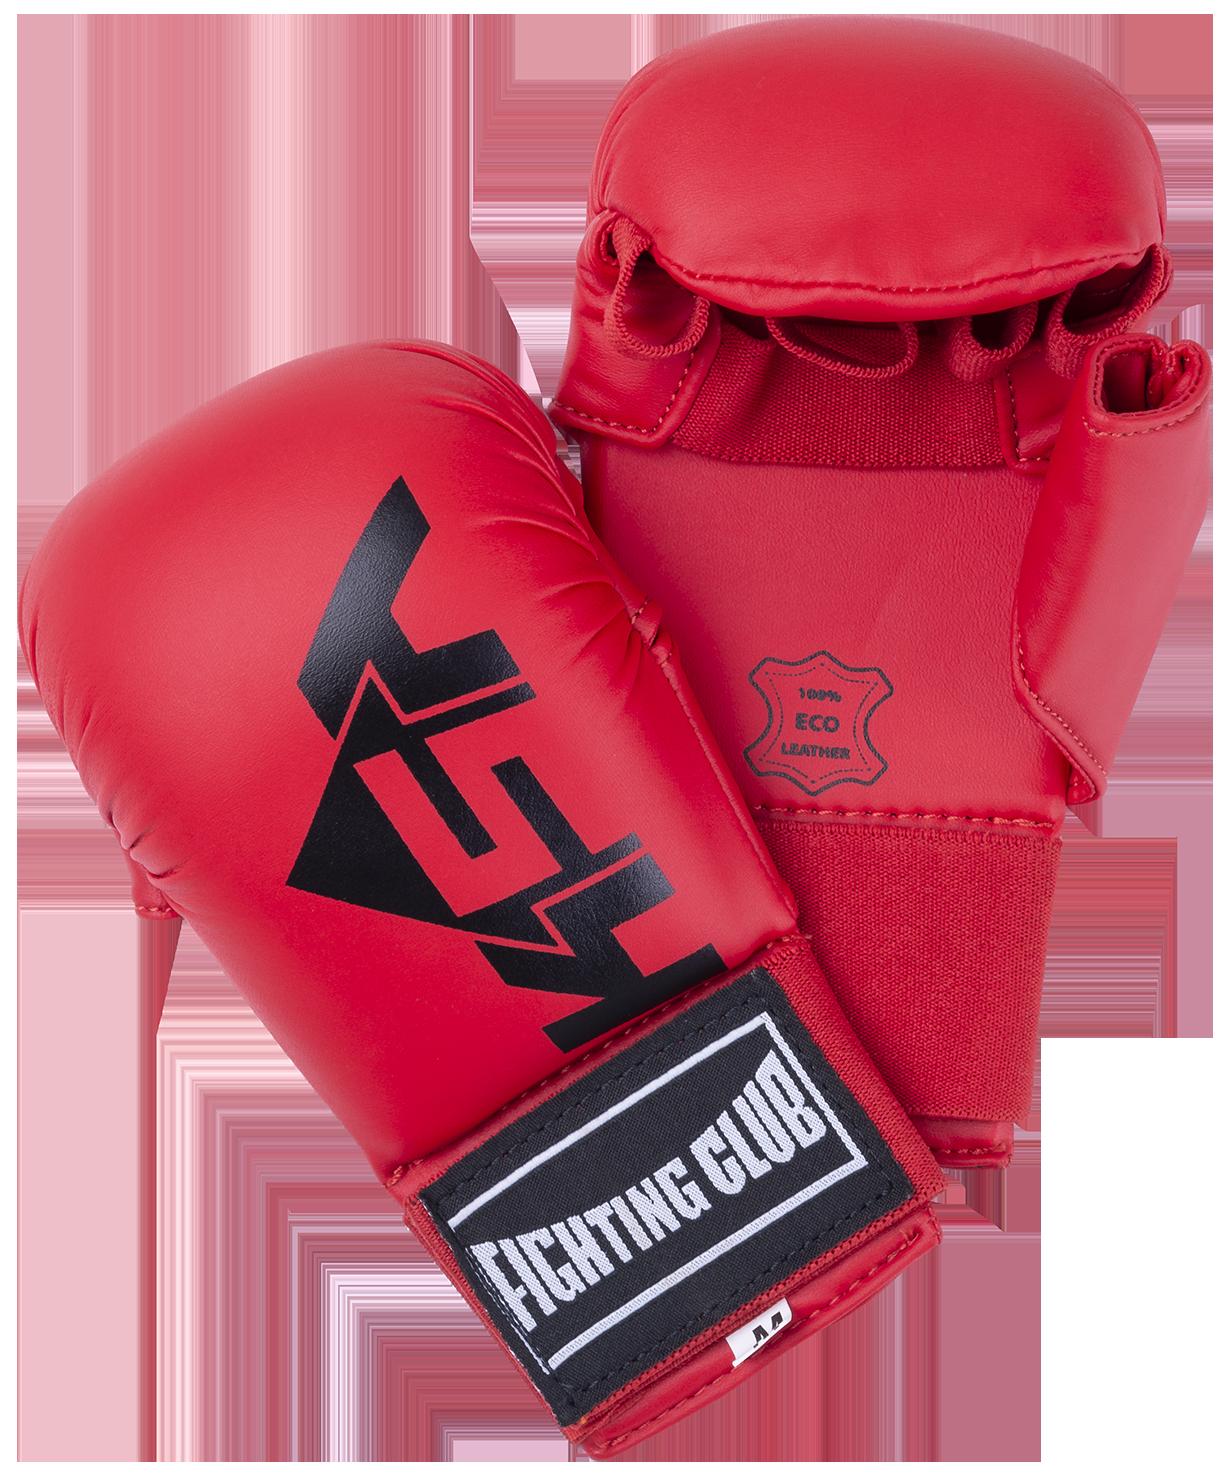 Перчатки/накладки Накладки для карате Kick с защитой большого пальца 94b92d2d248095889b054393bac0f57b.png